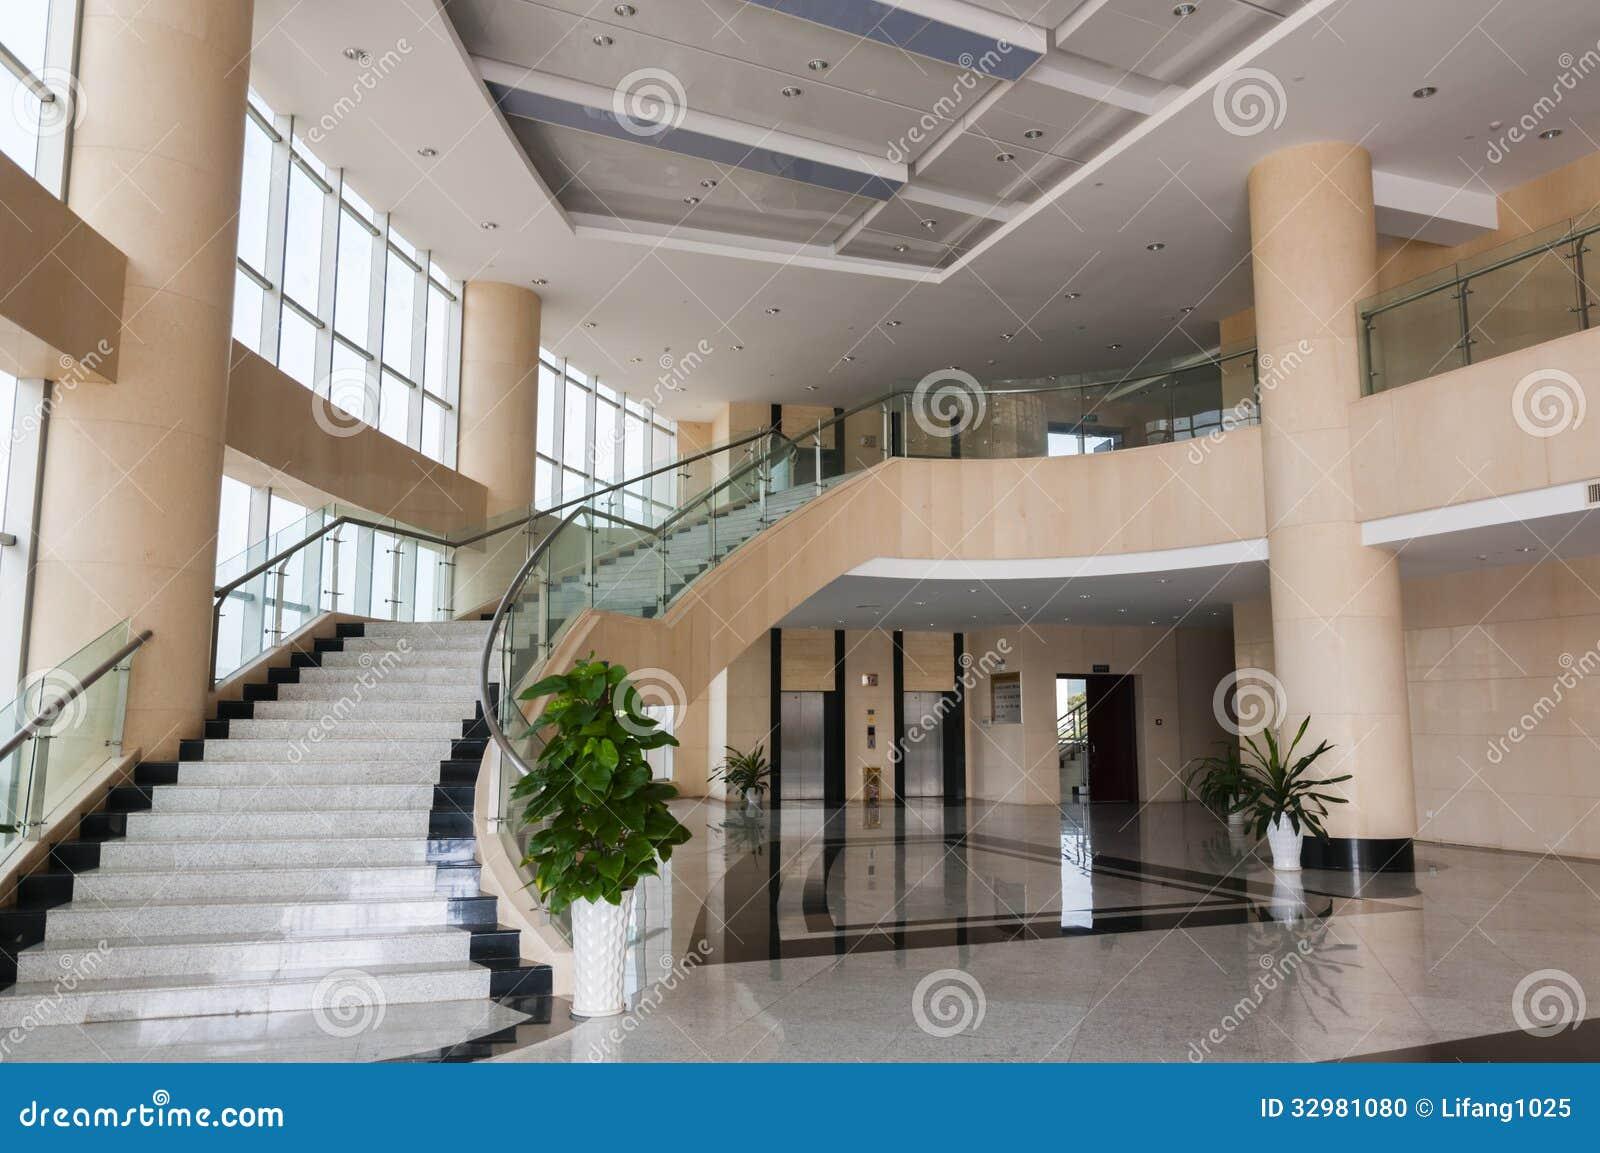 Modern Hotel Lobby modern hotel lobby stock image - image: 33911841